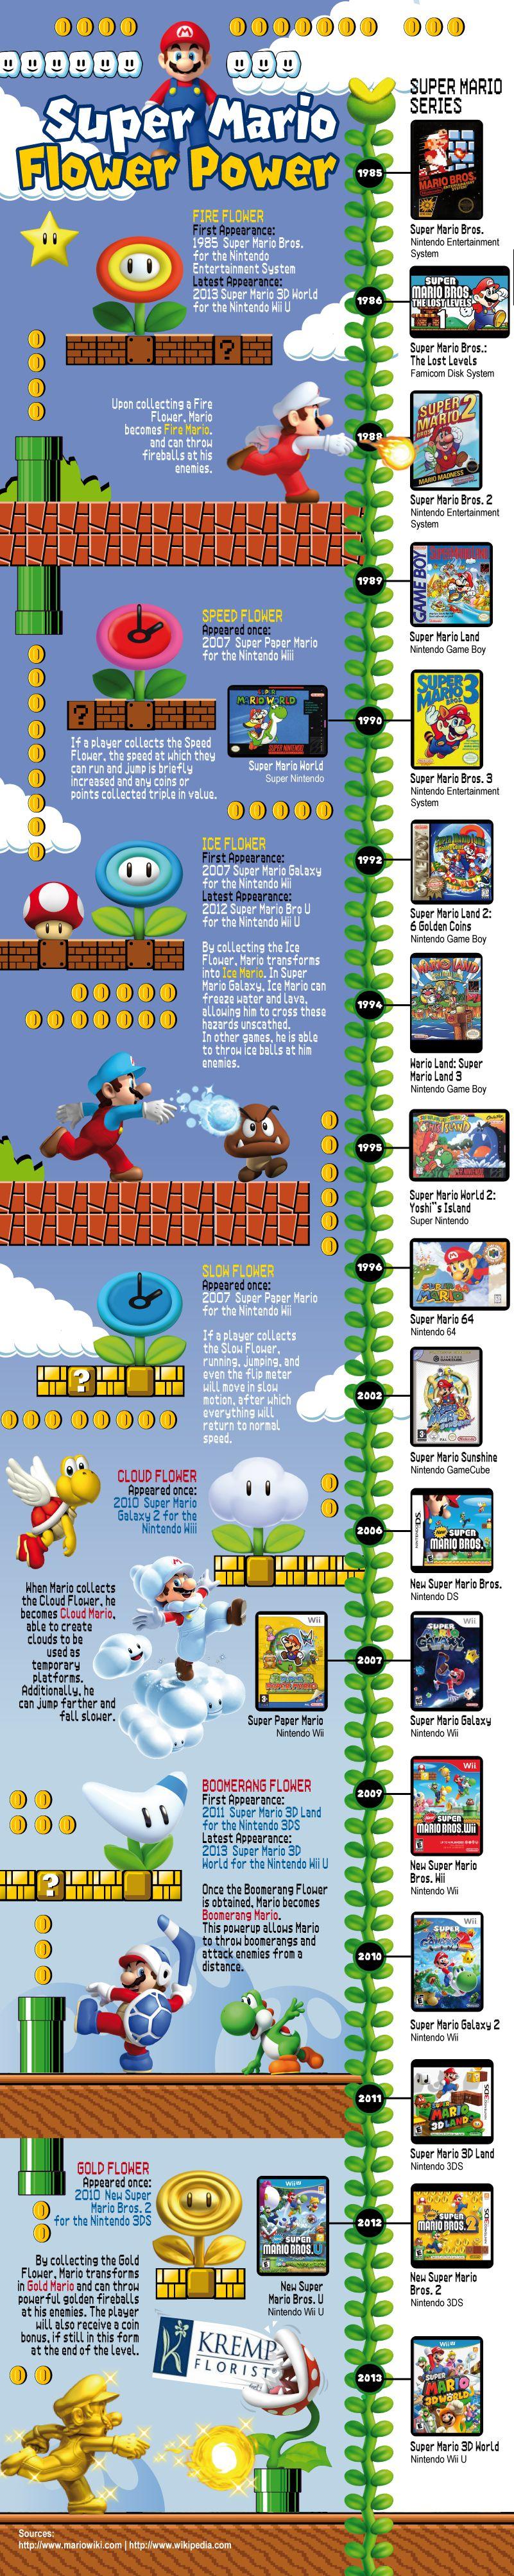 Super-Mario-Flower-Power-infographic-infographie-liste-fleur-history [801 x 4017]